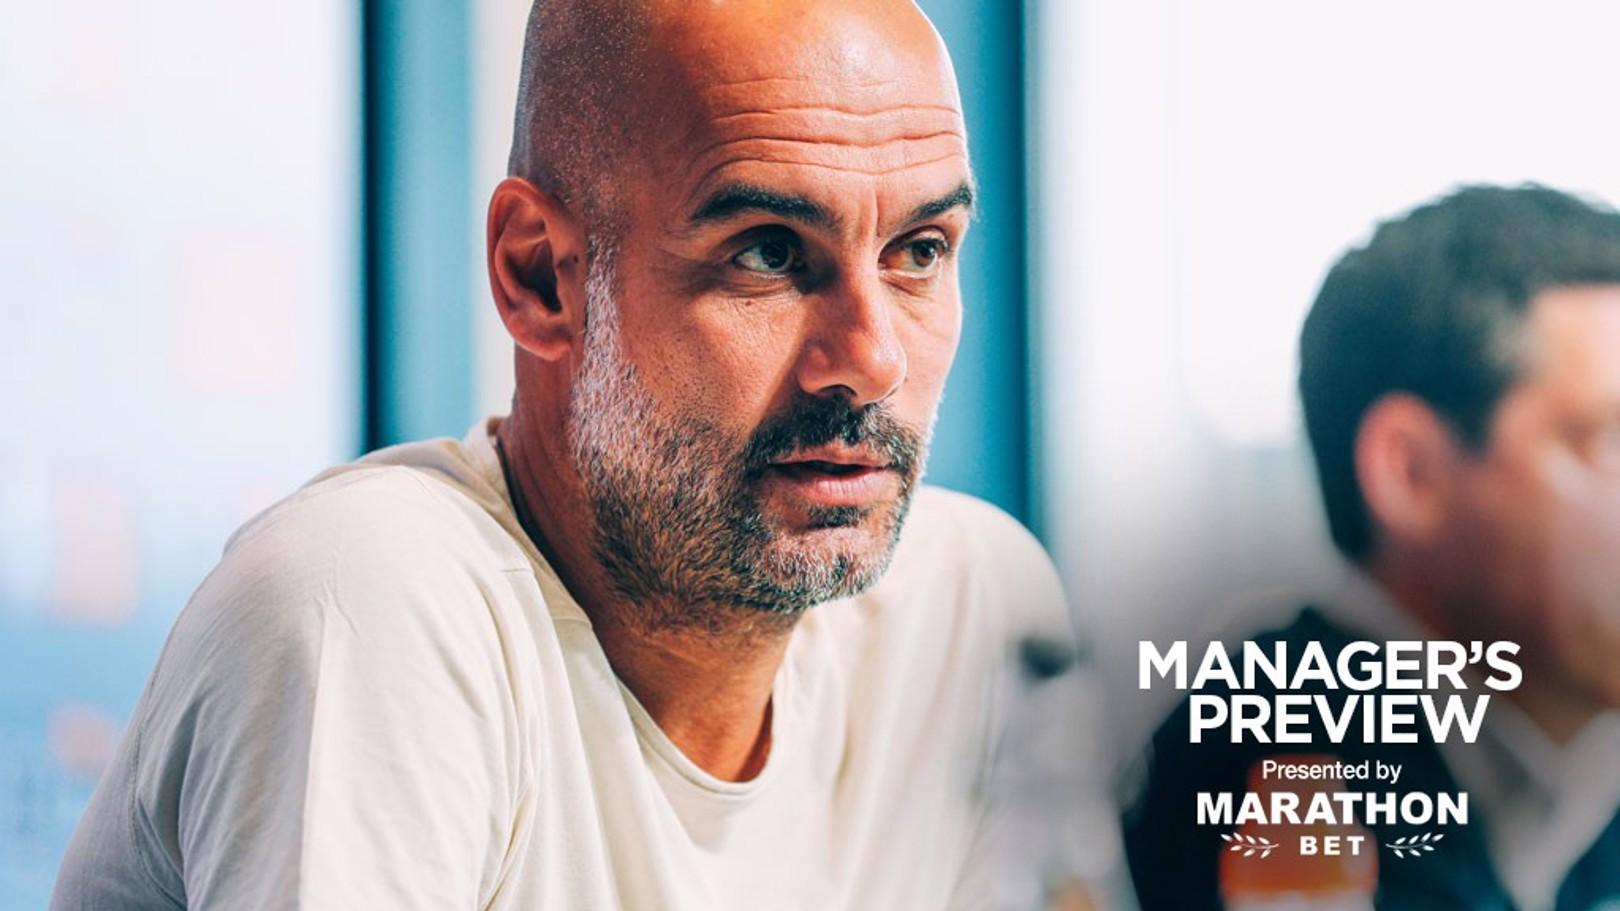 PRE-MATCH: Pep Guardiola addresses the media ahead of the community shield.